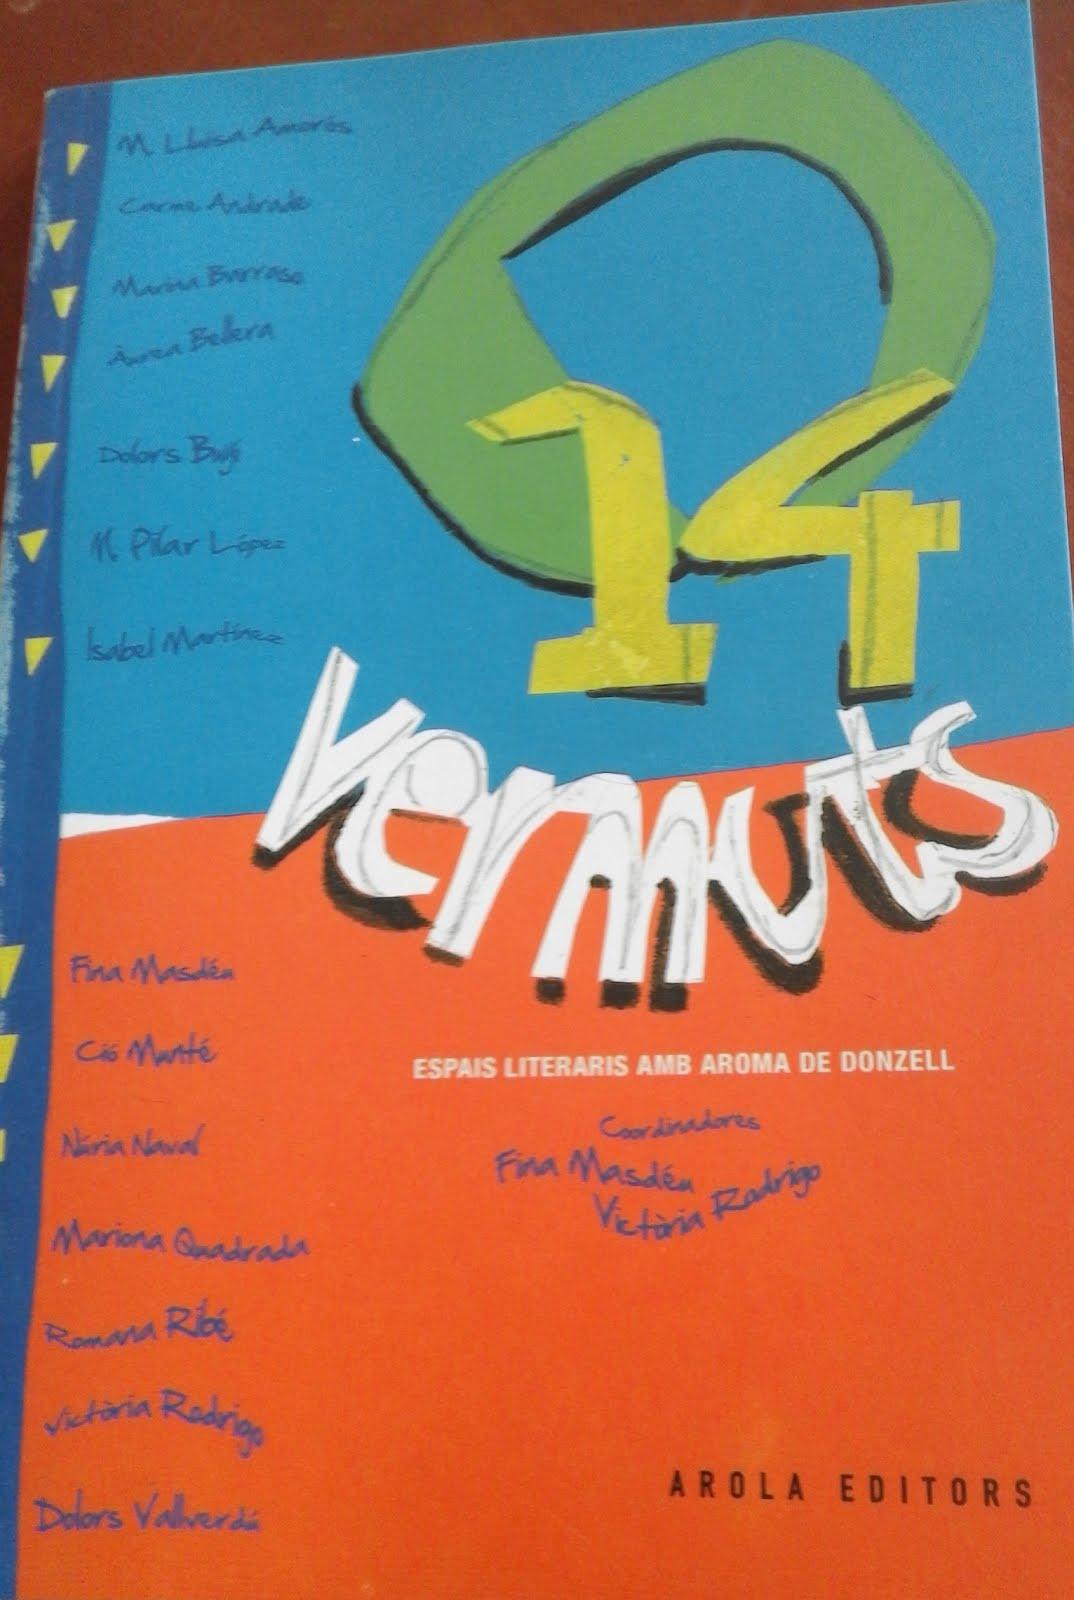 14 vermuts (Arola, 2015)